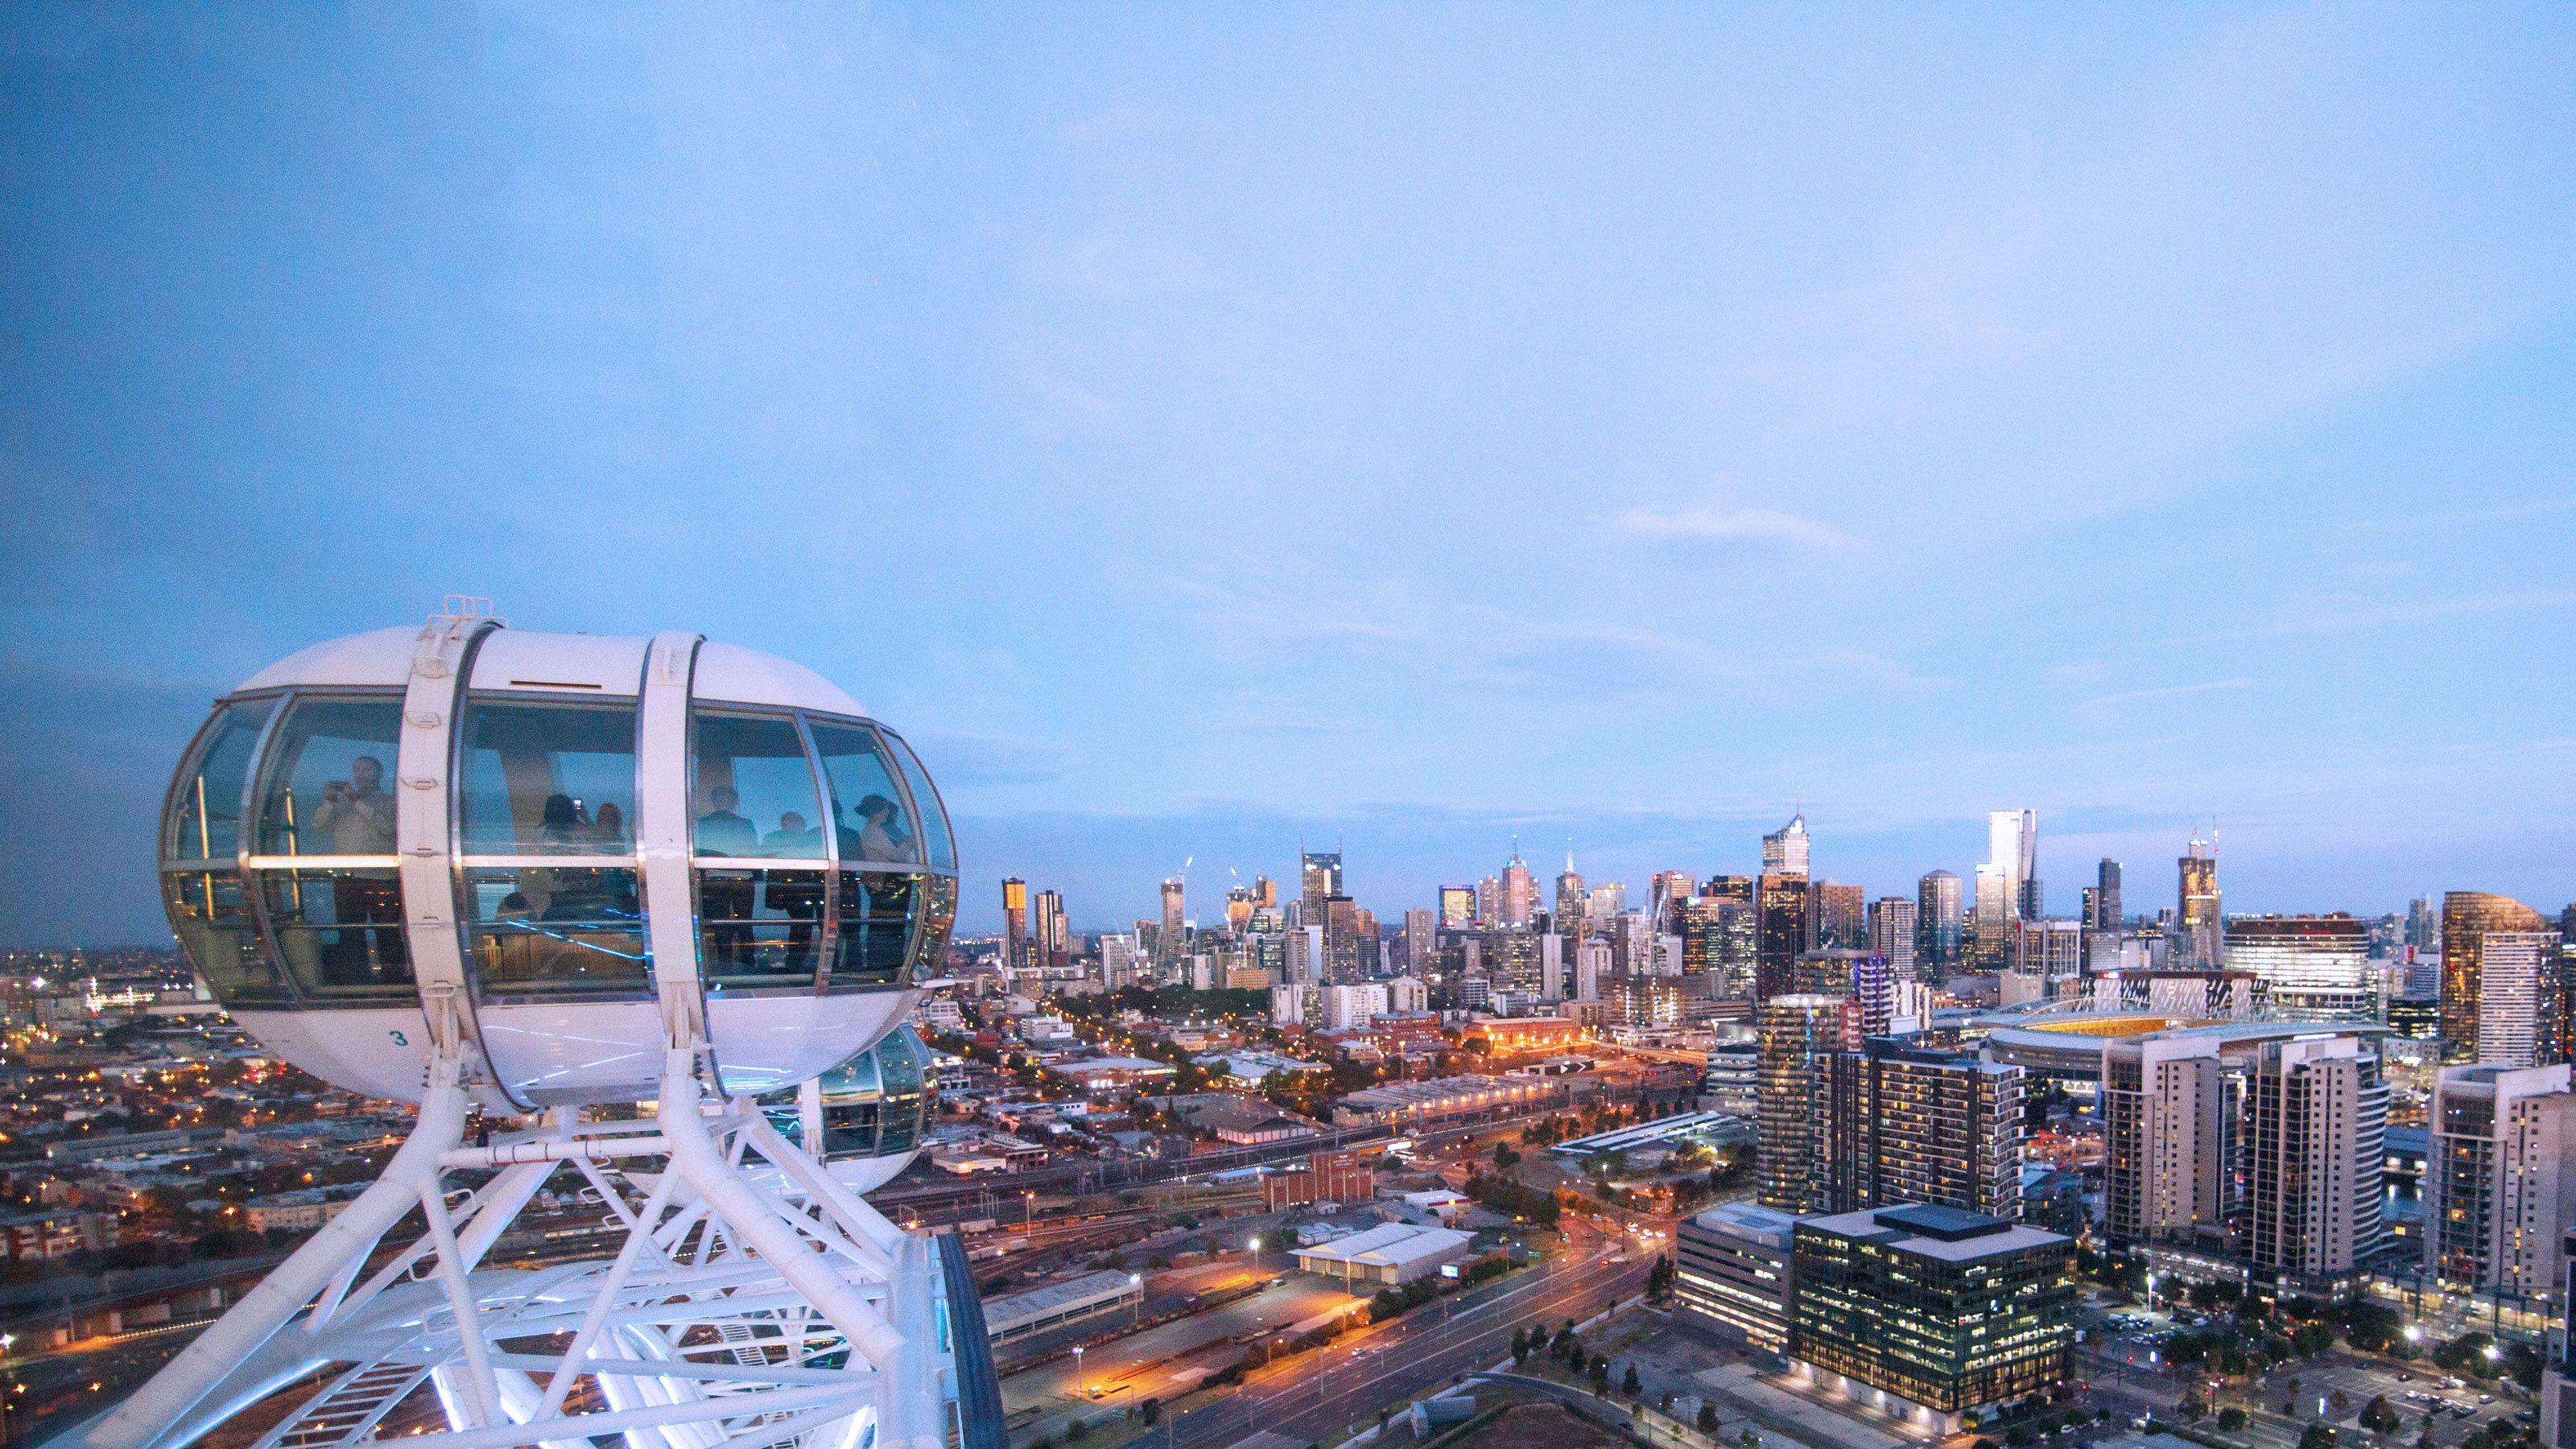 High up in the Melbourne Star Observation Wheel in Melbourne